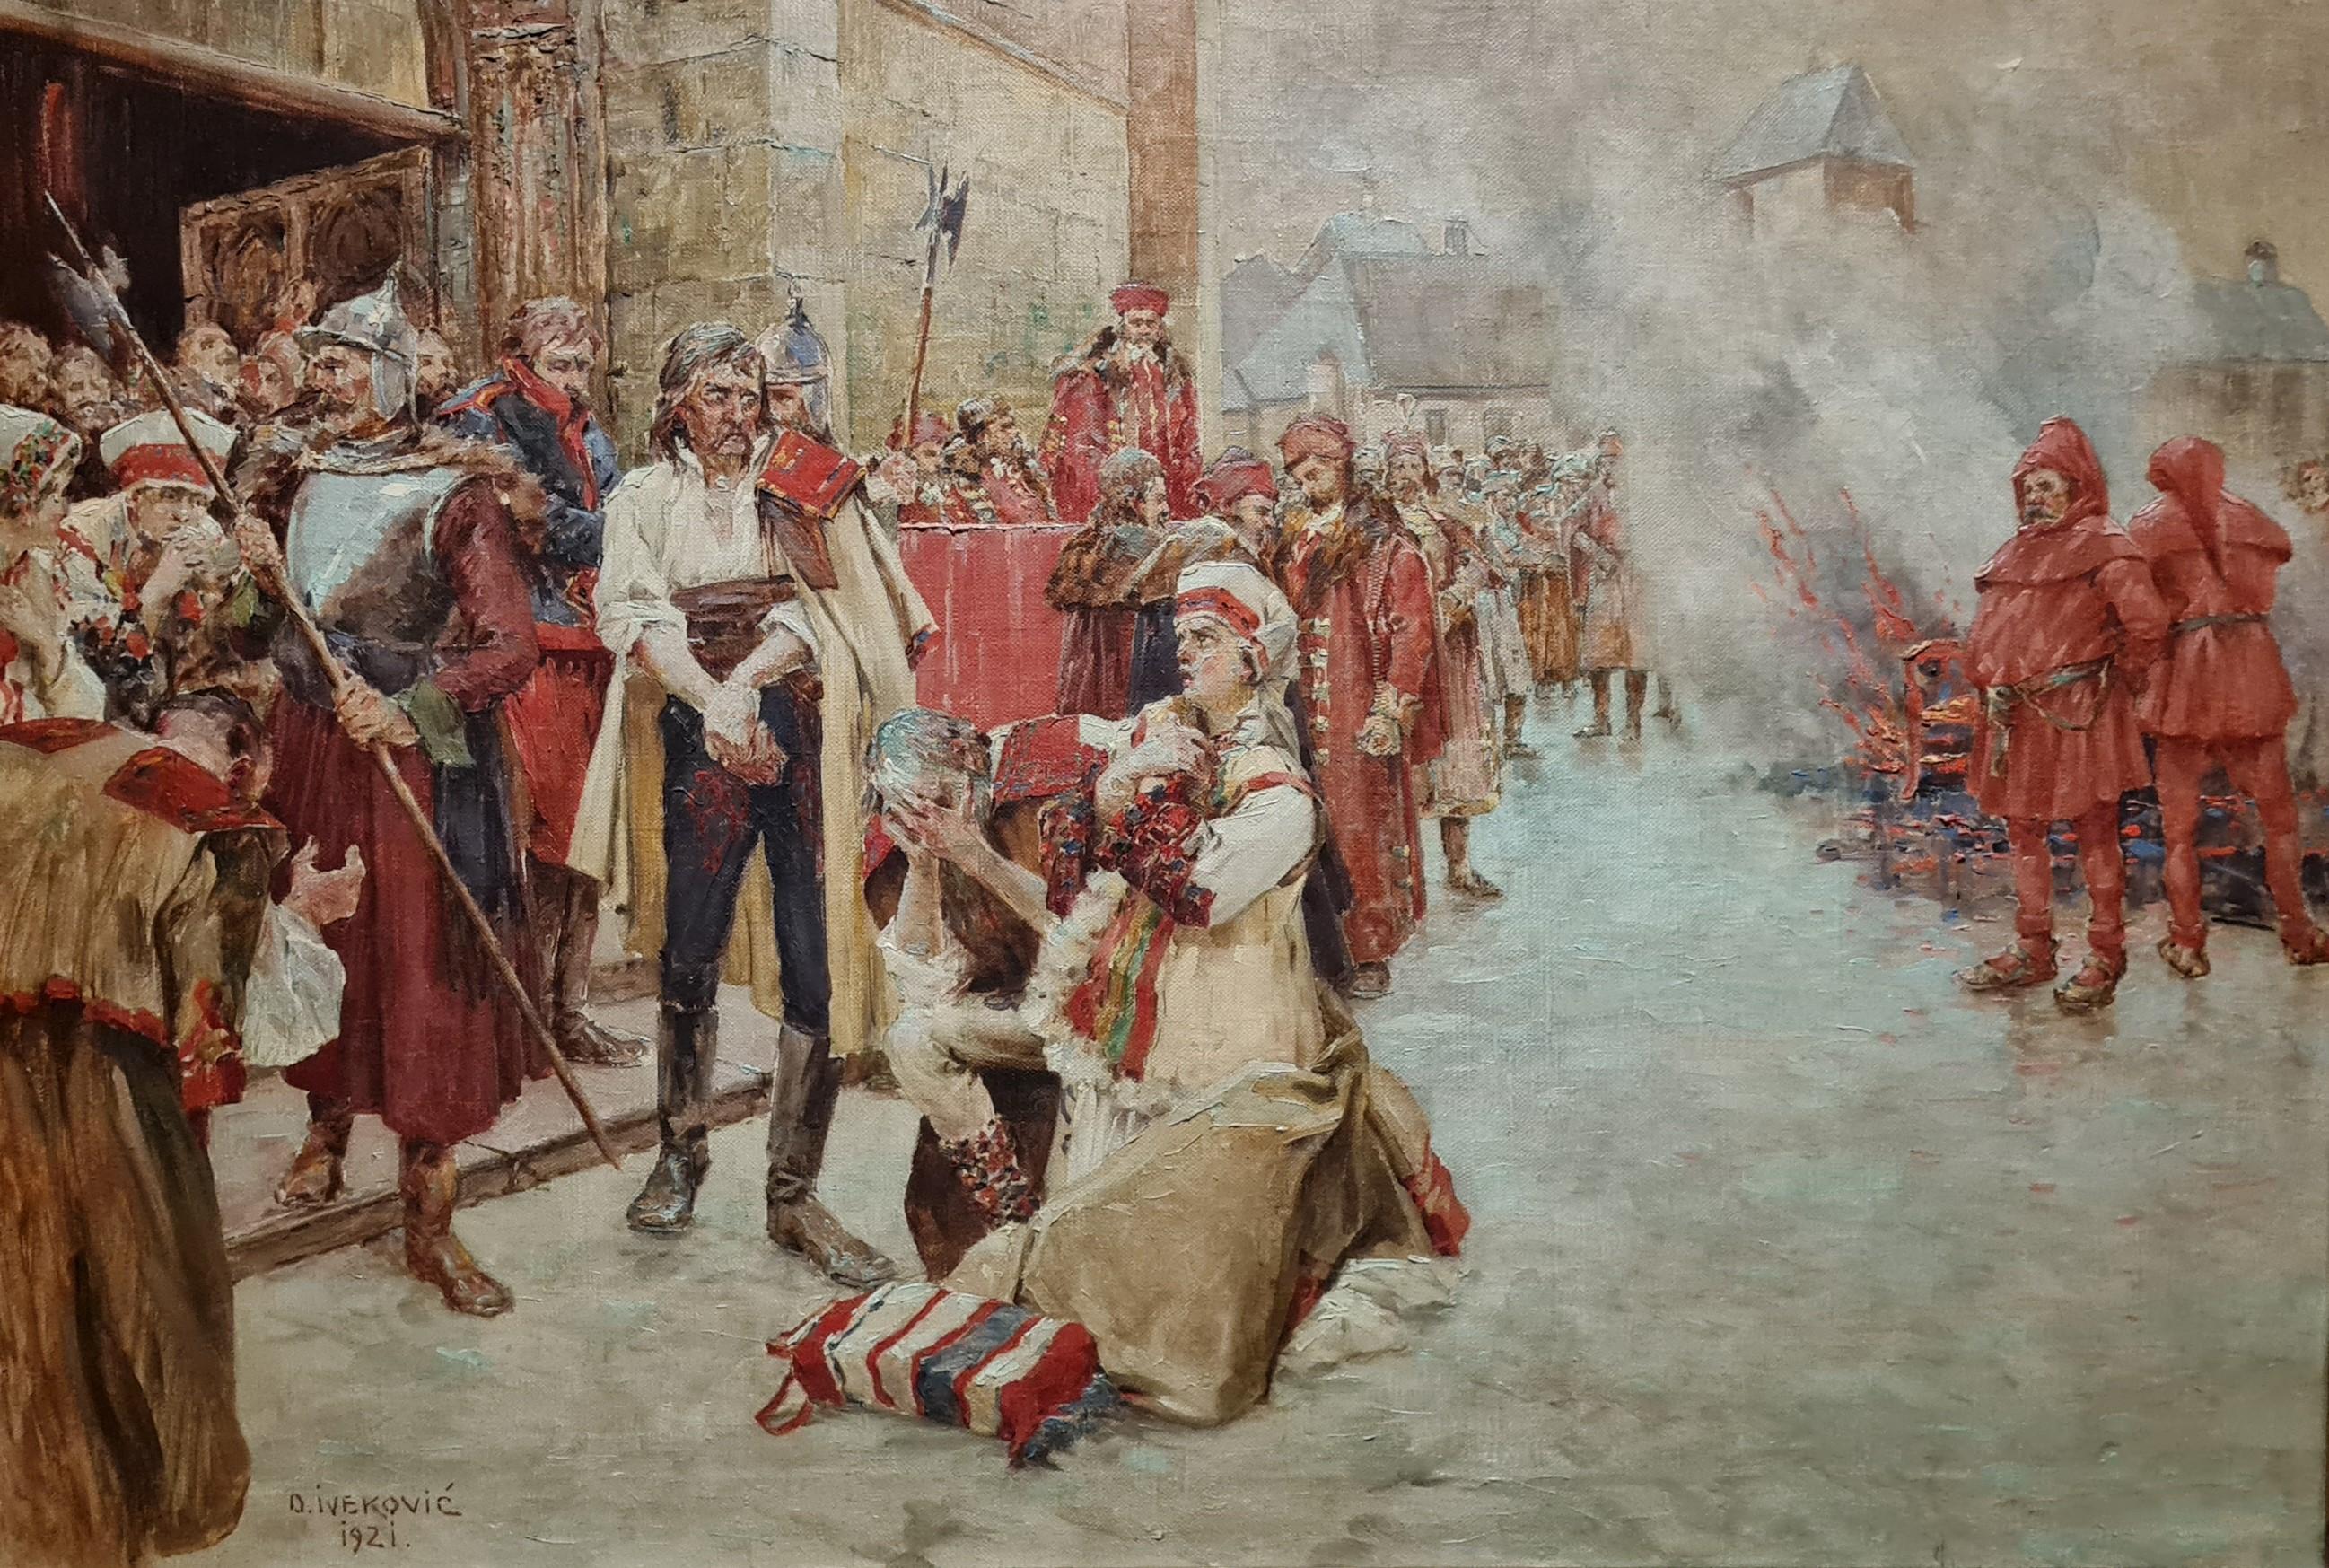 from Moises croatia dating customs